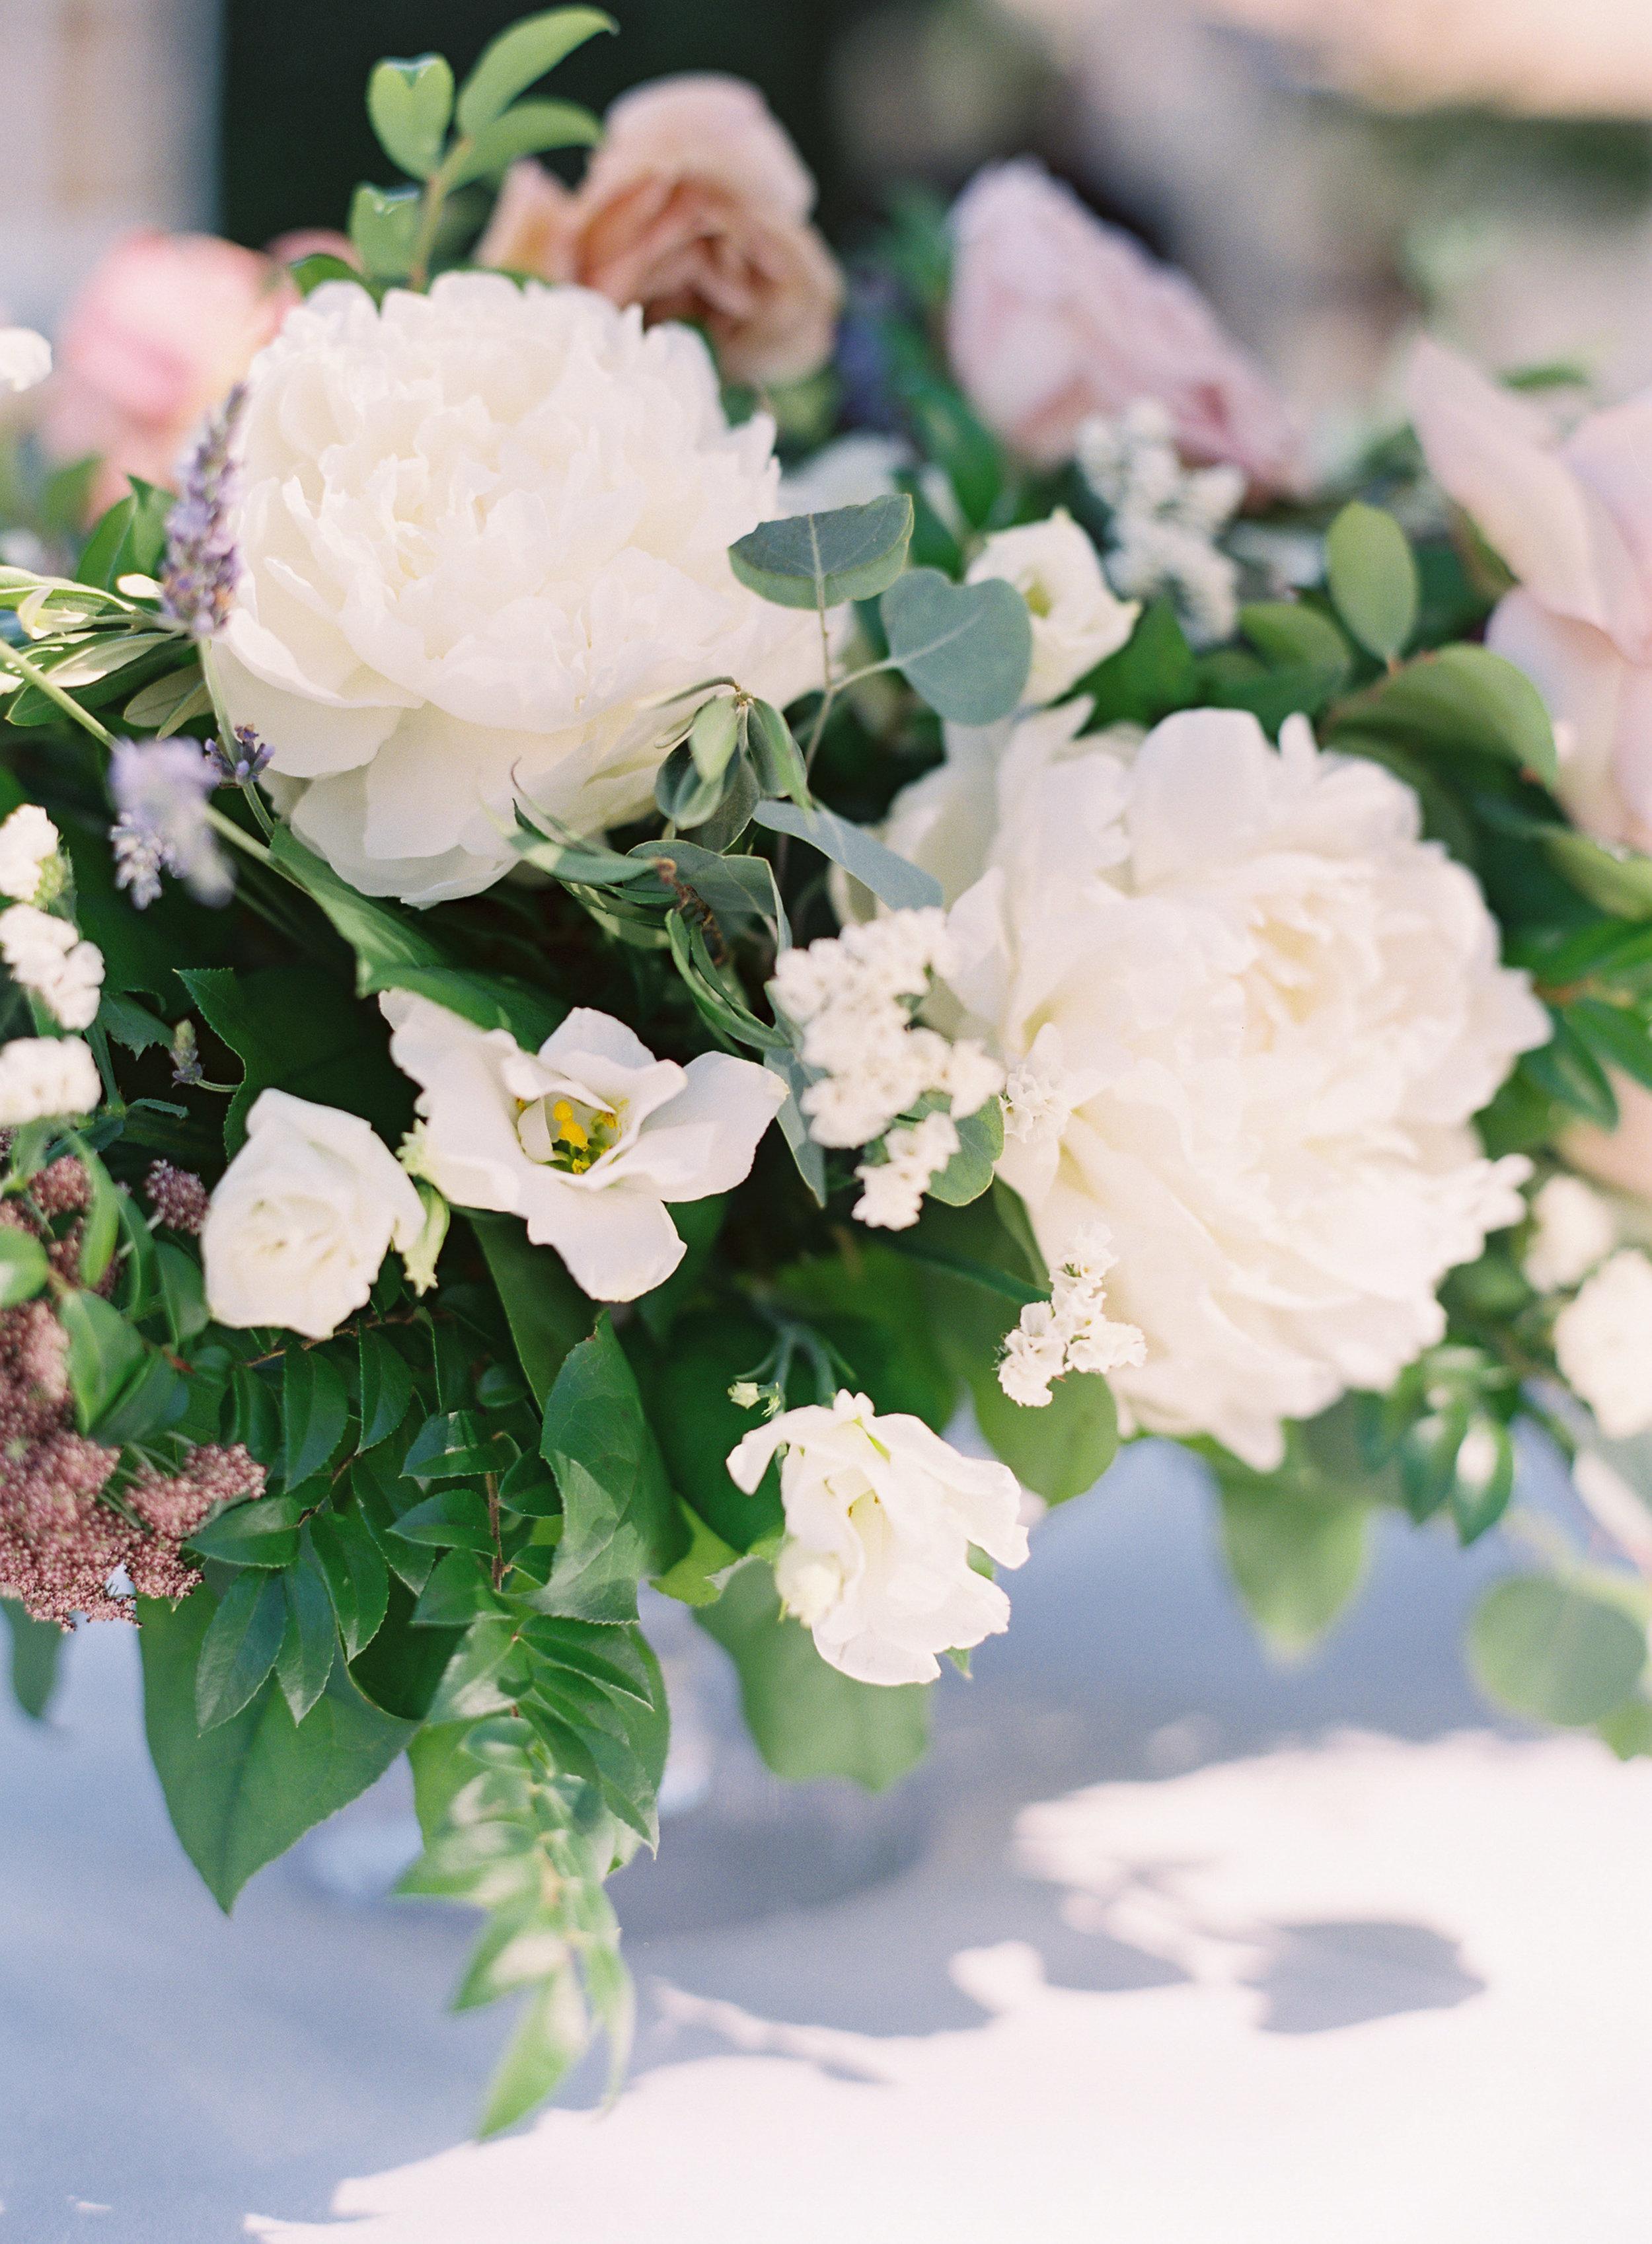 Triunfo_Creek_Winery_Wedding-191-Jen-Huang-JL-324-Jen-Huang-009964-R1-011.jpg